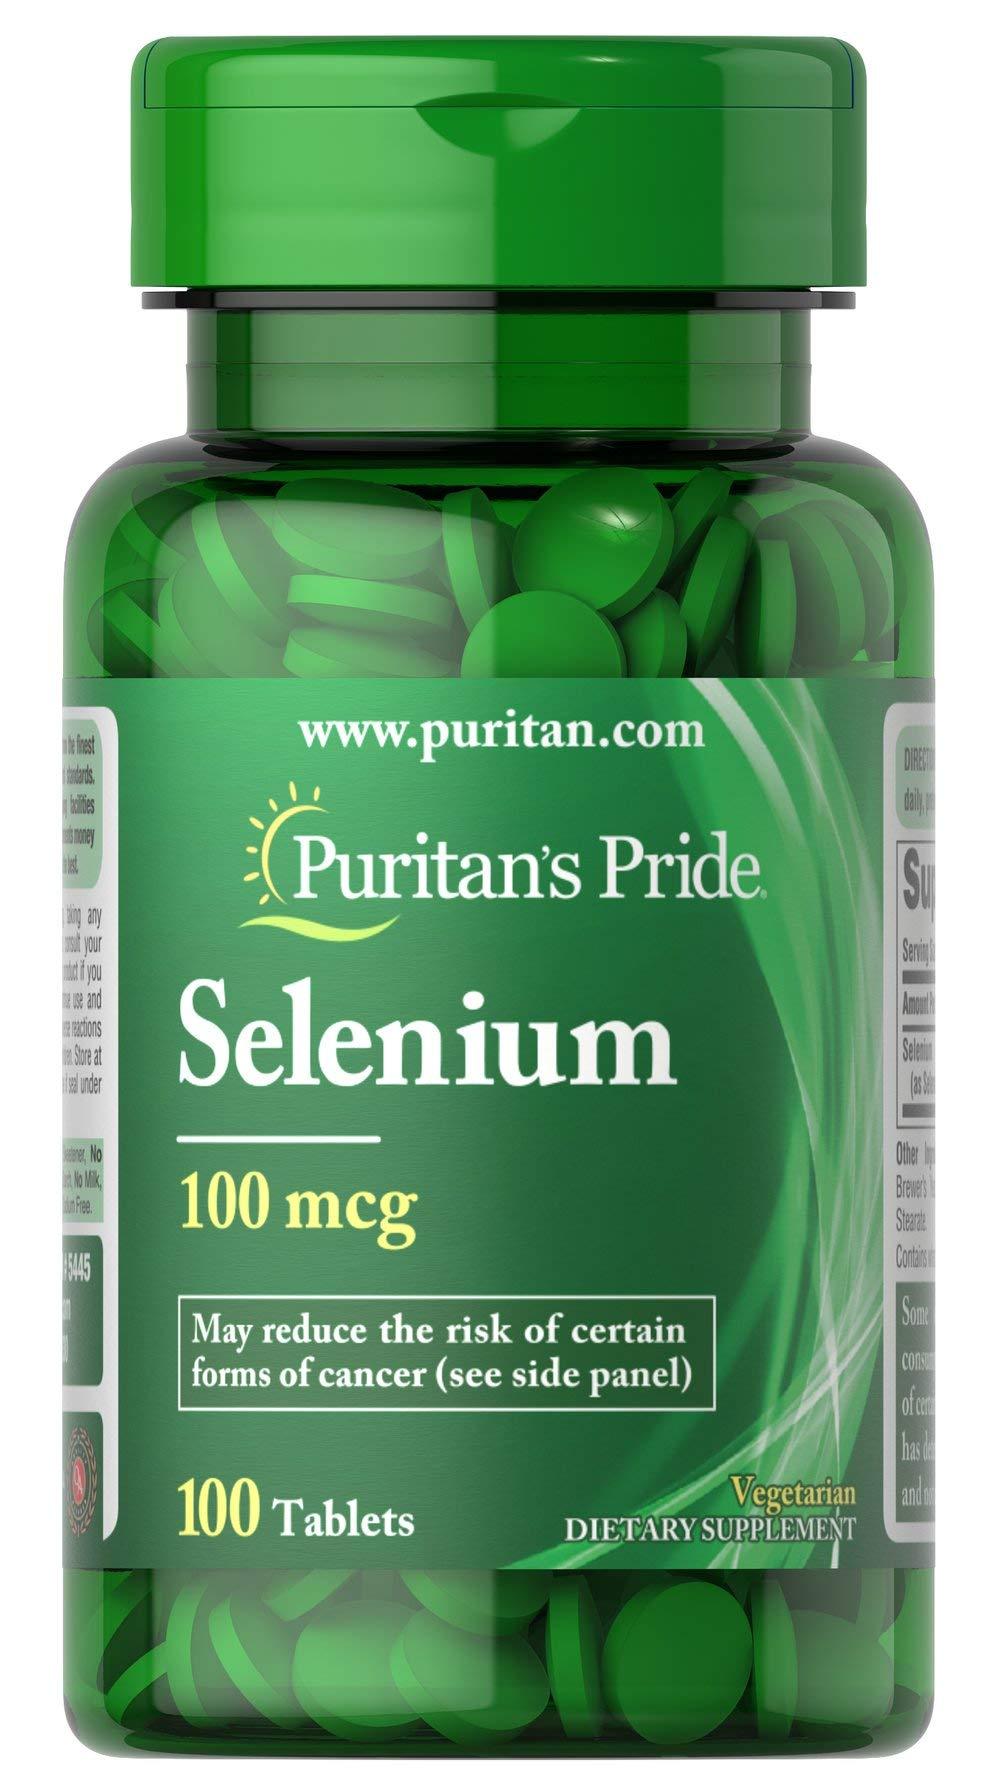 Puritan's Pride Selenium 100 mcg-100 Tablets